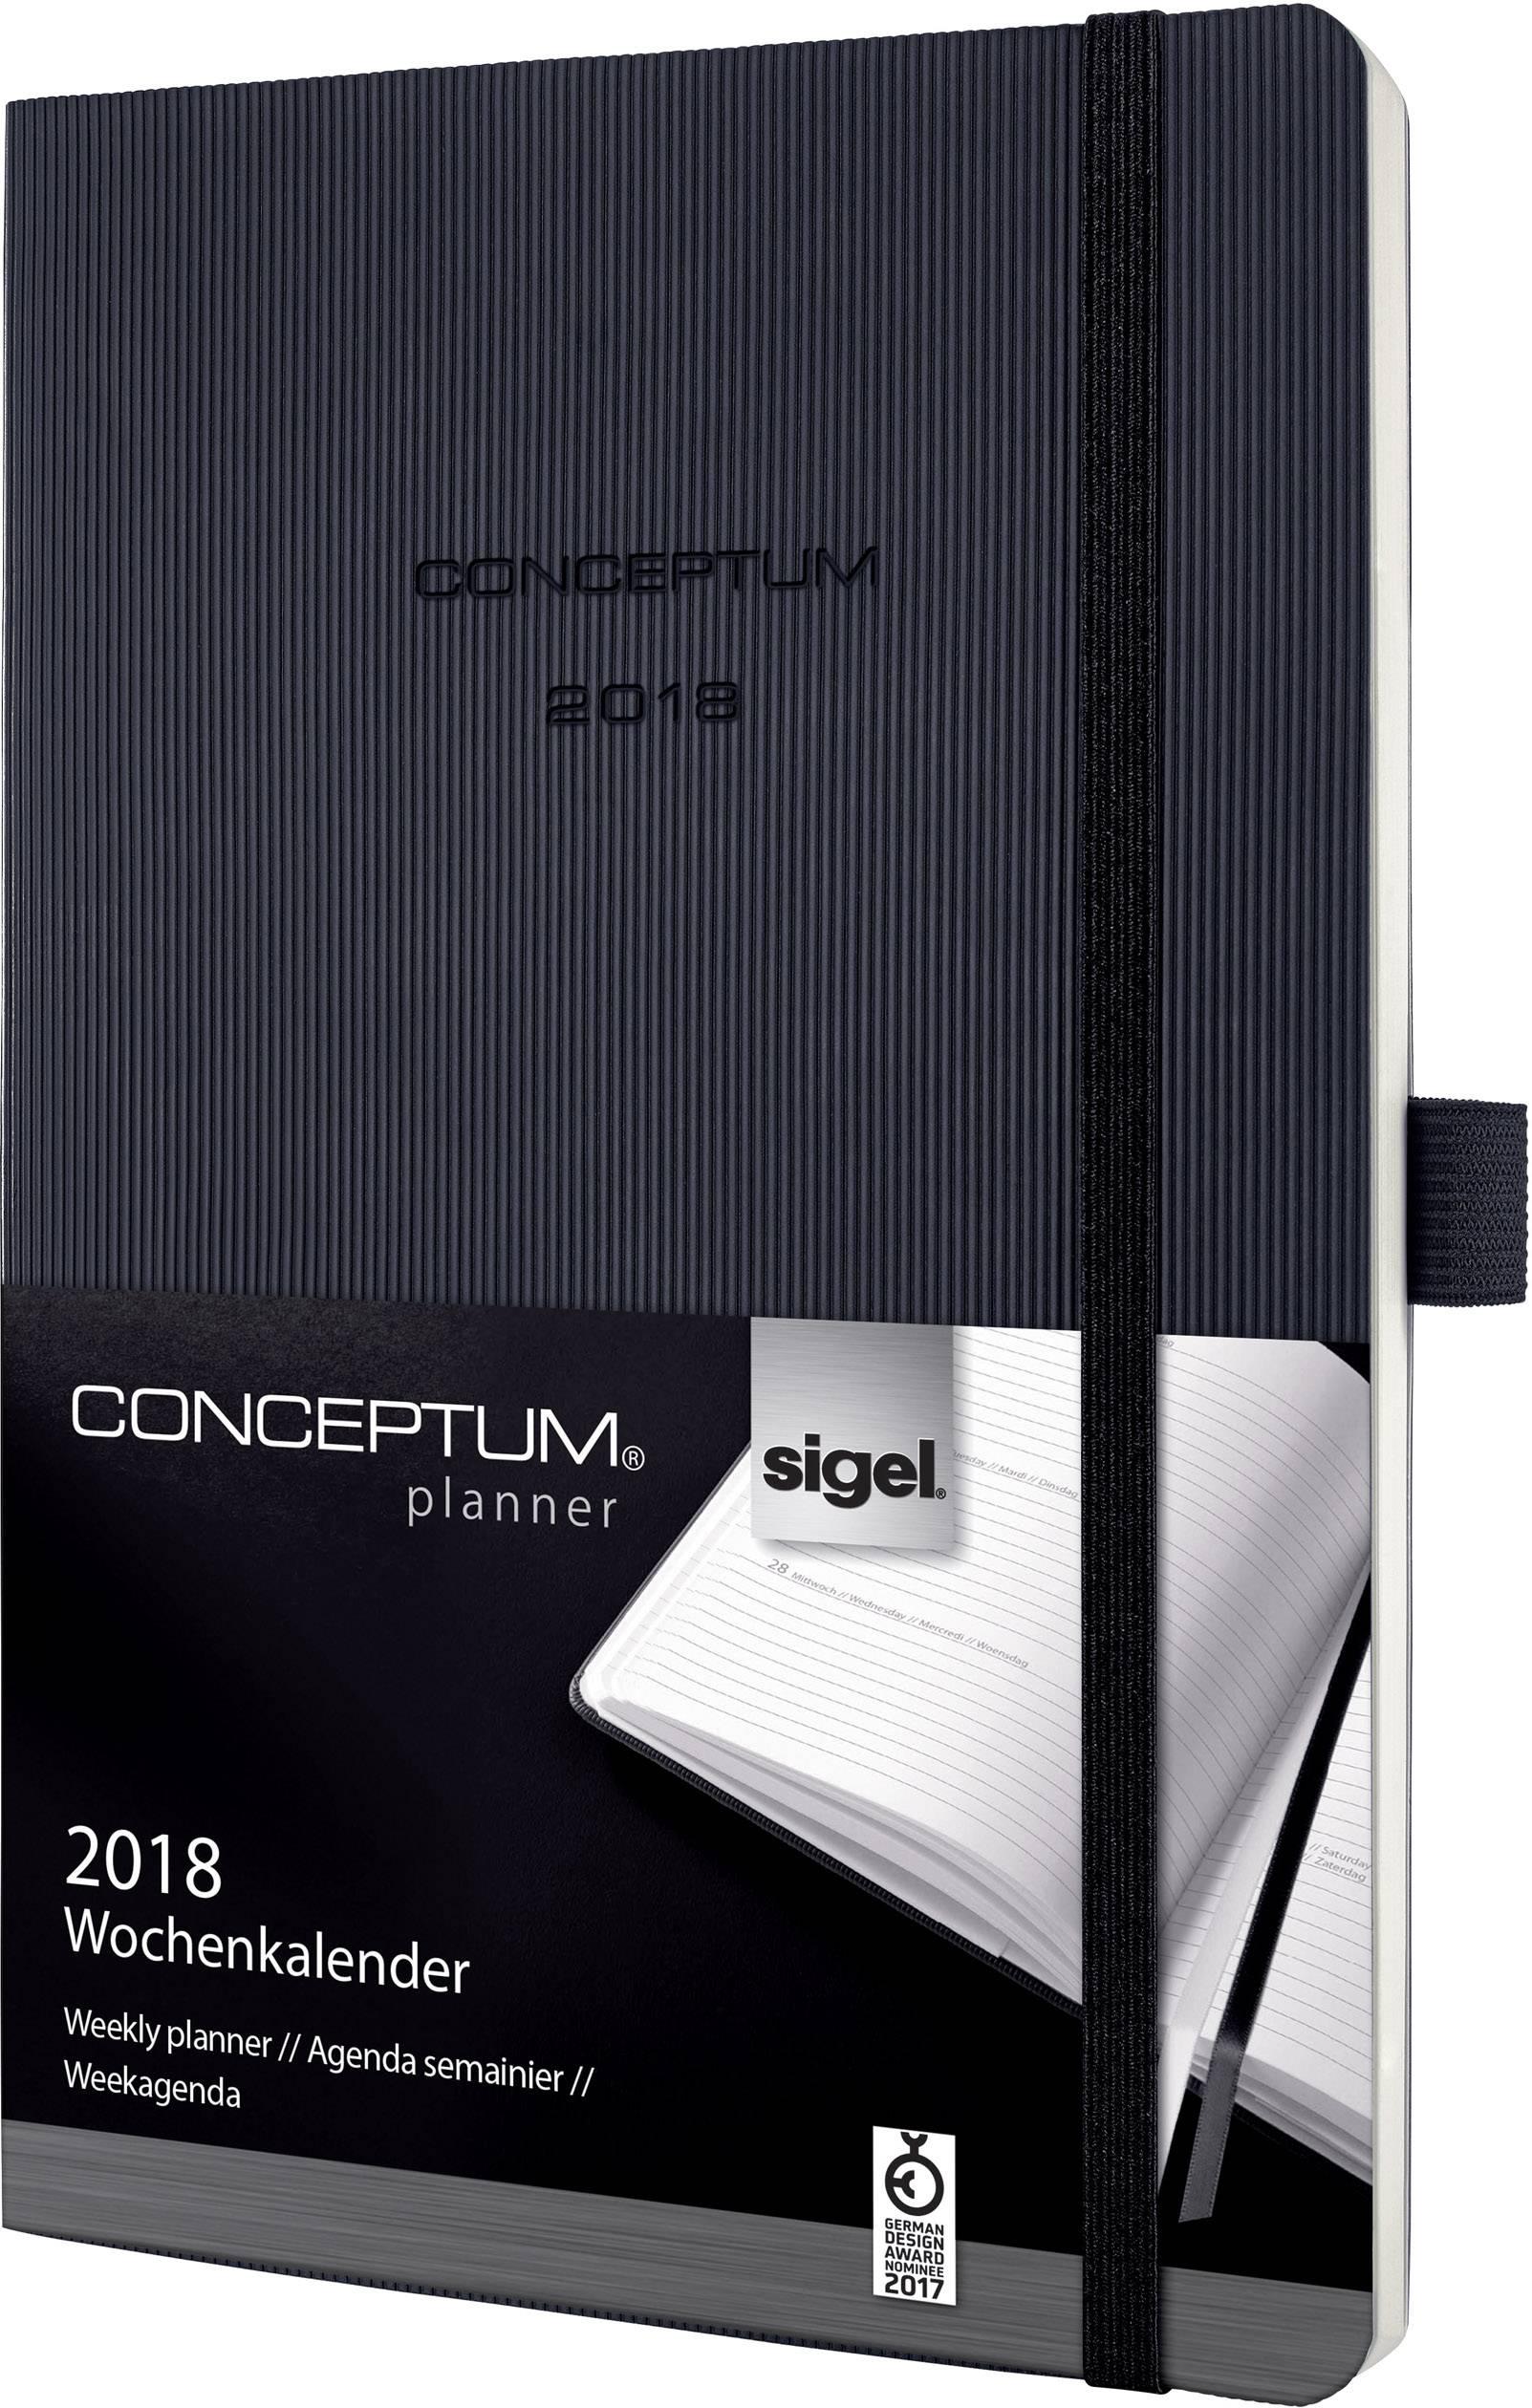 Pagina Calendario Settimanale.Sigel C1822 Conceptum 2018 Calendario Settimanale Soft Cover 192 Pagine Nero 2 Pagine 1 Settimana